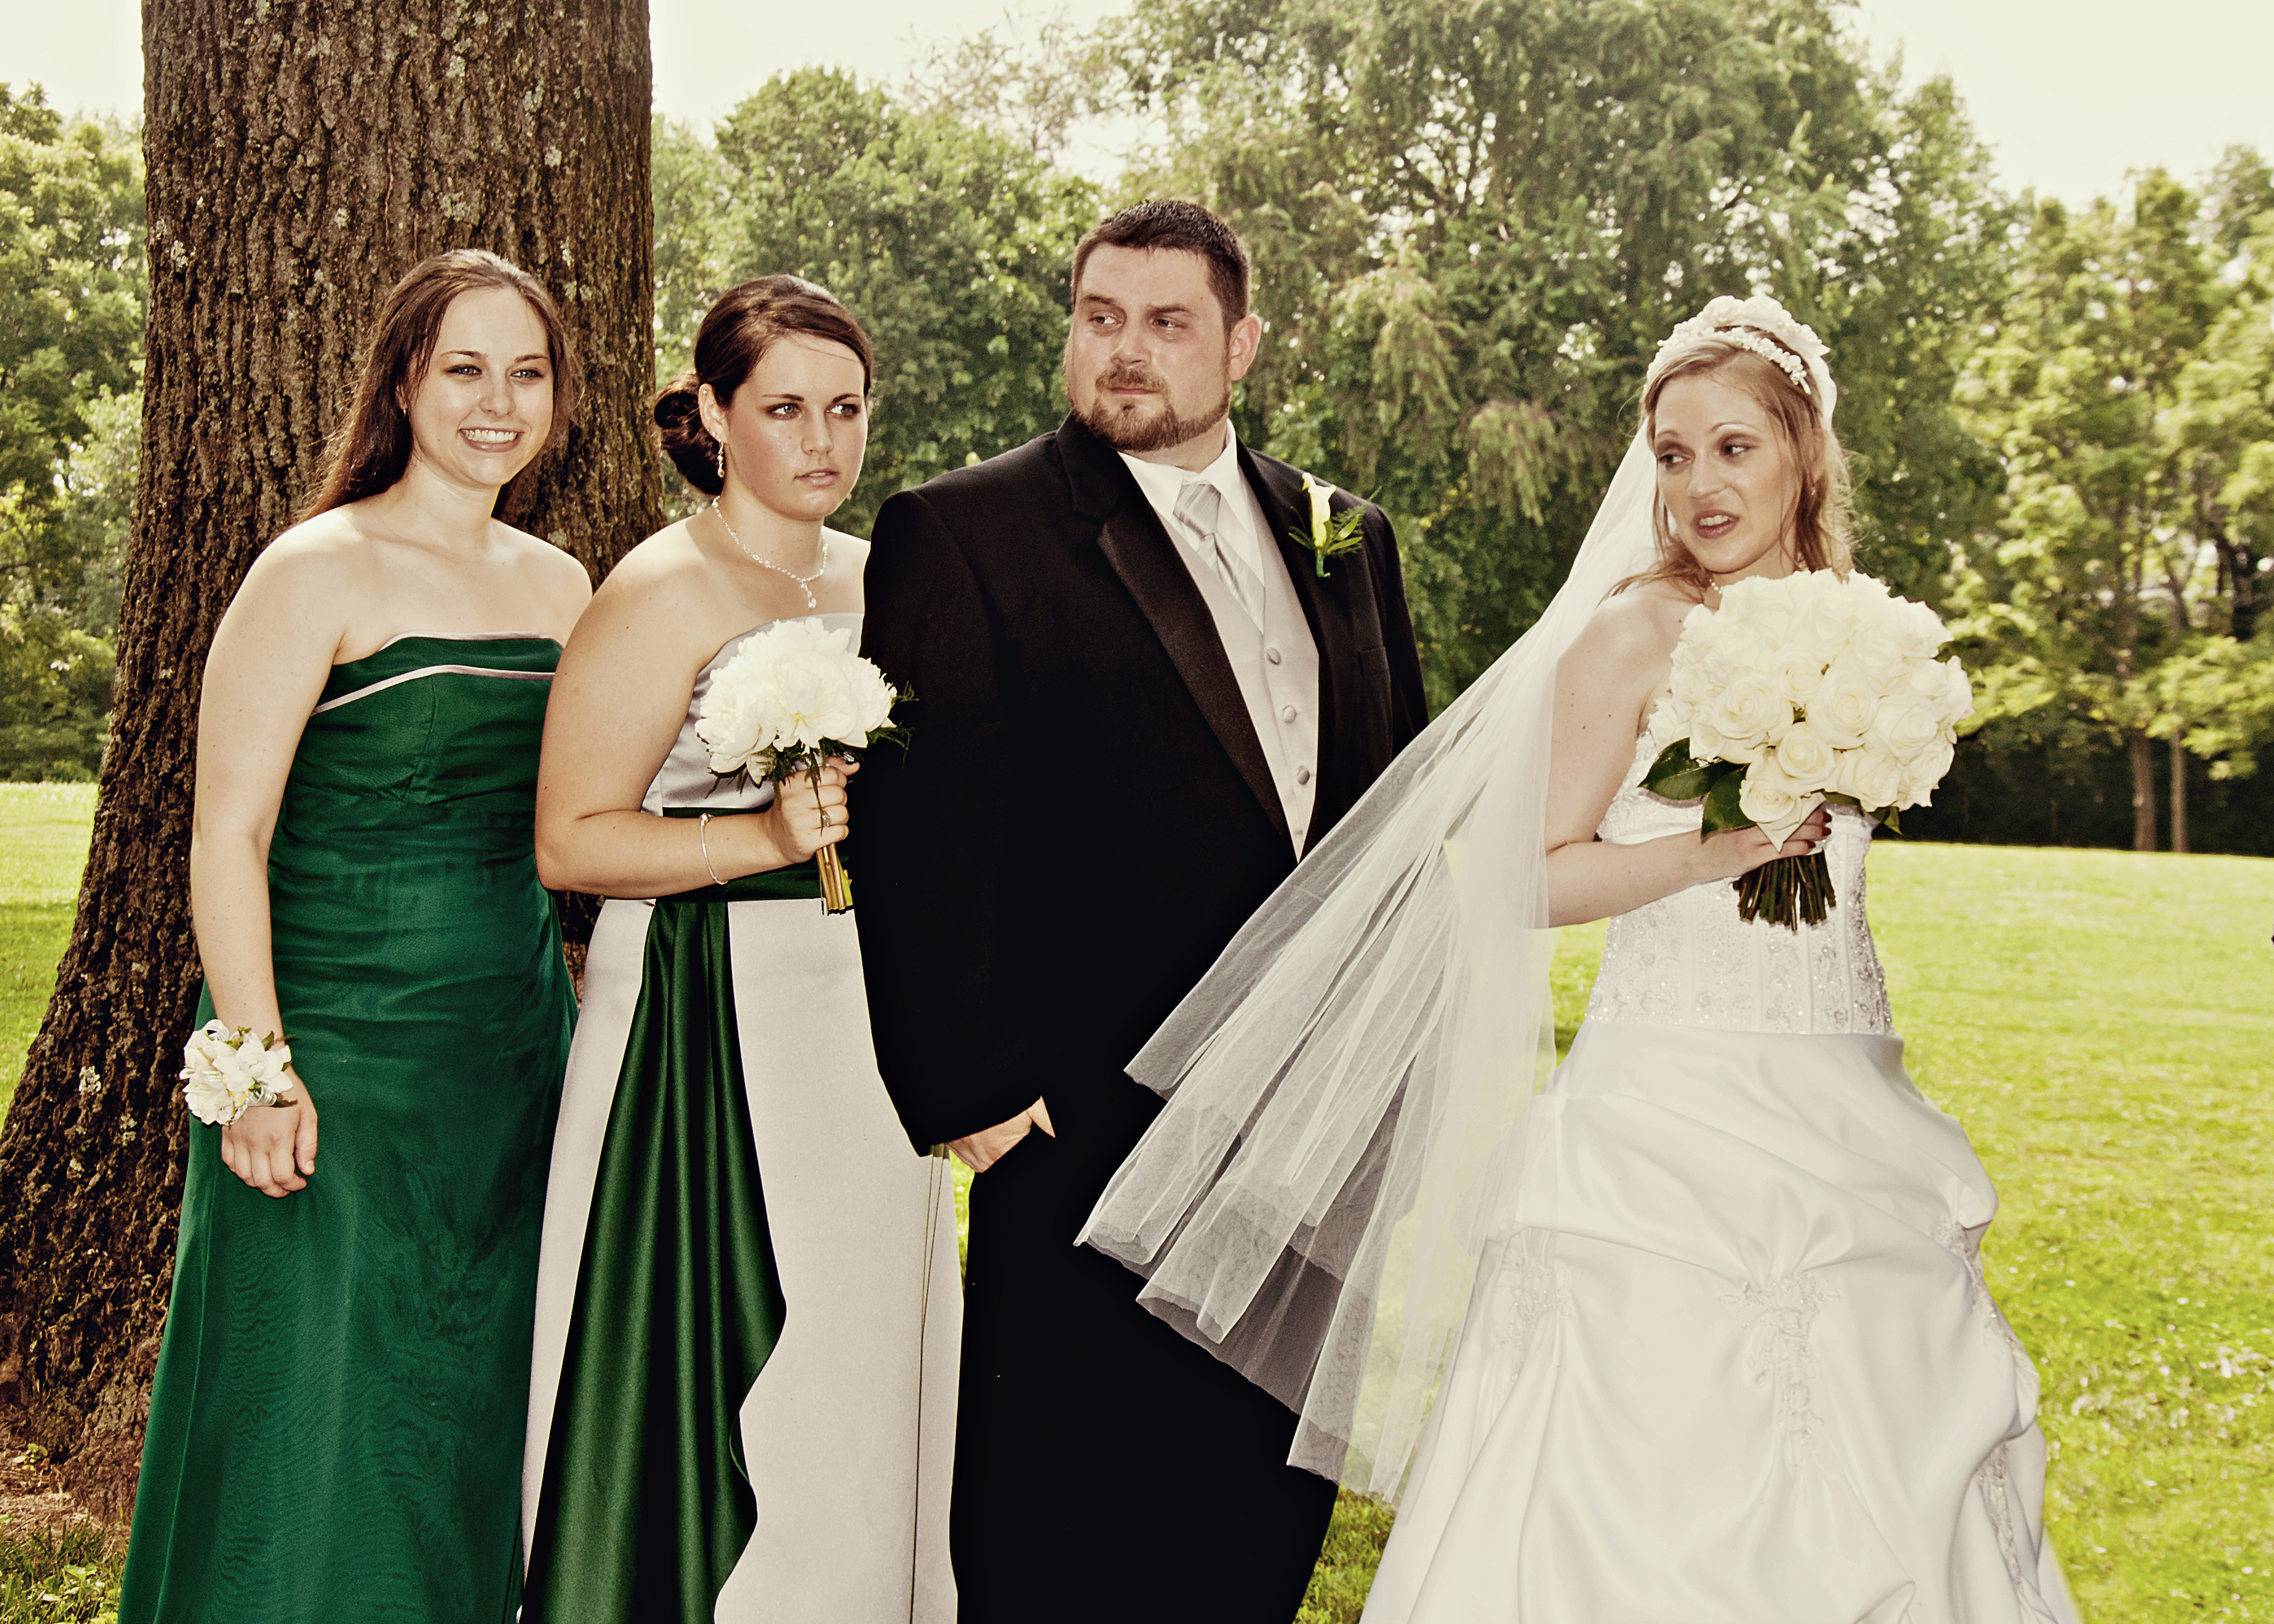 Ceremony, Flowers & Decor, Wedding Dresses, Veils, Fashion, green, silver, dress, Ceremony Flowers, Bride Bouquets, Bride, Flowers, Veil, Flower Wedding Dresses